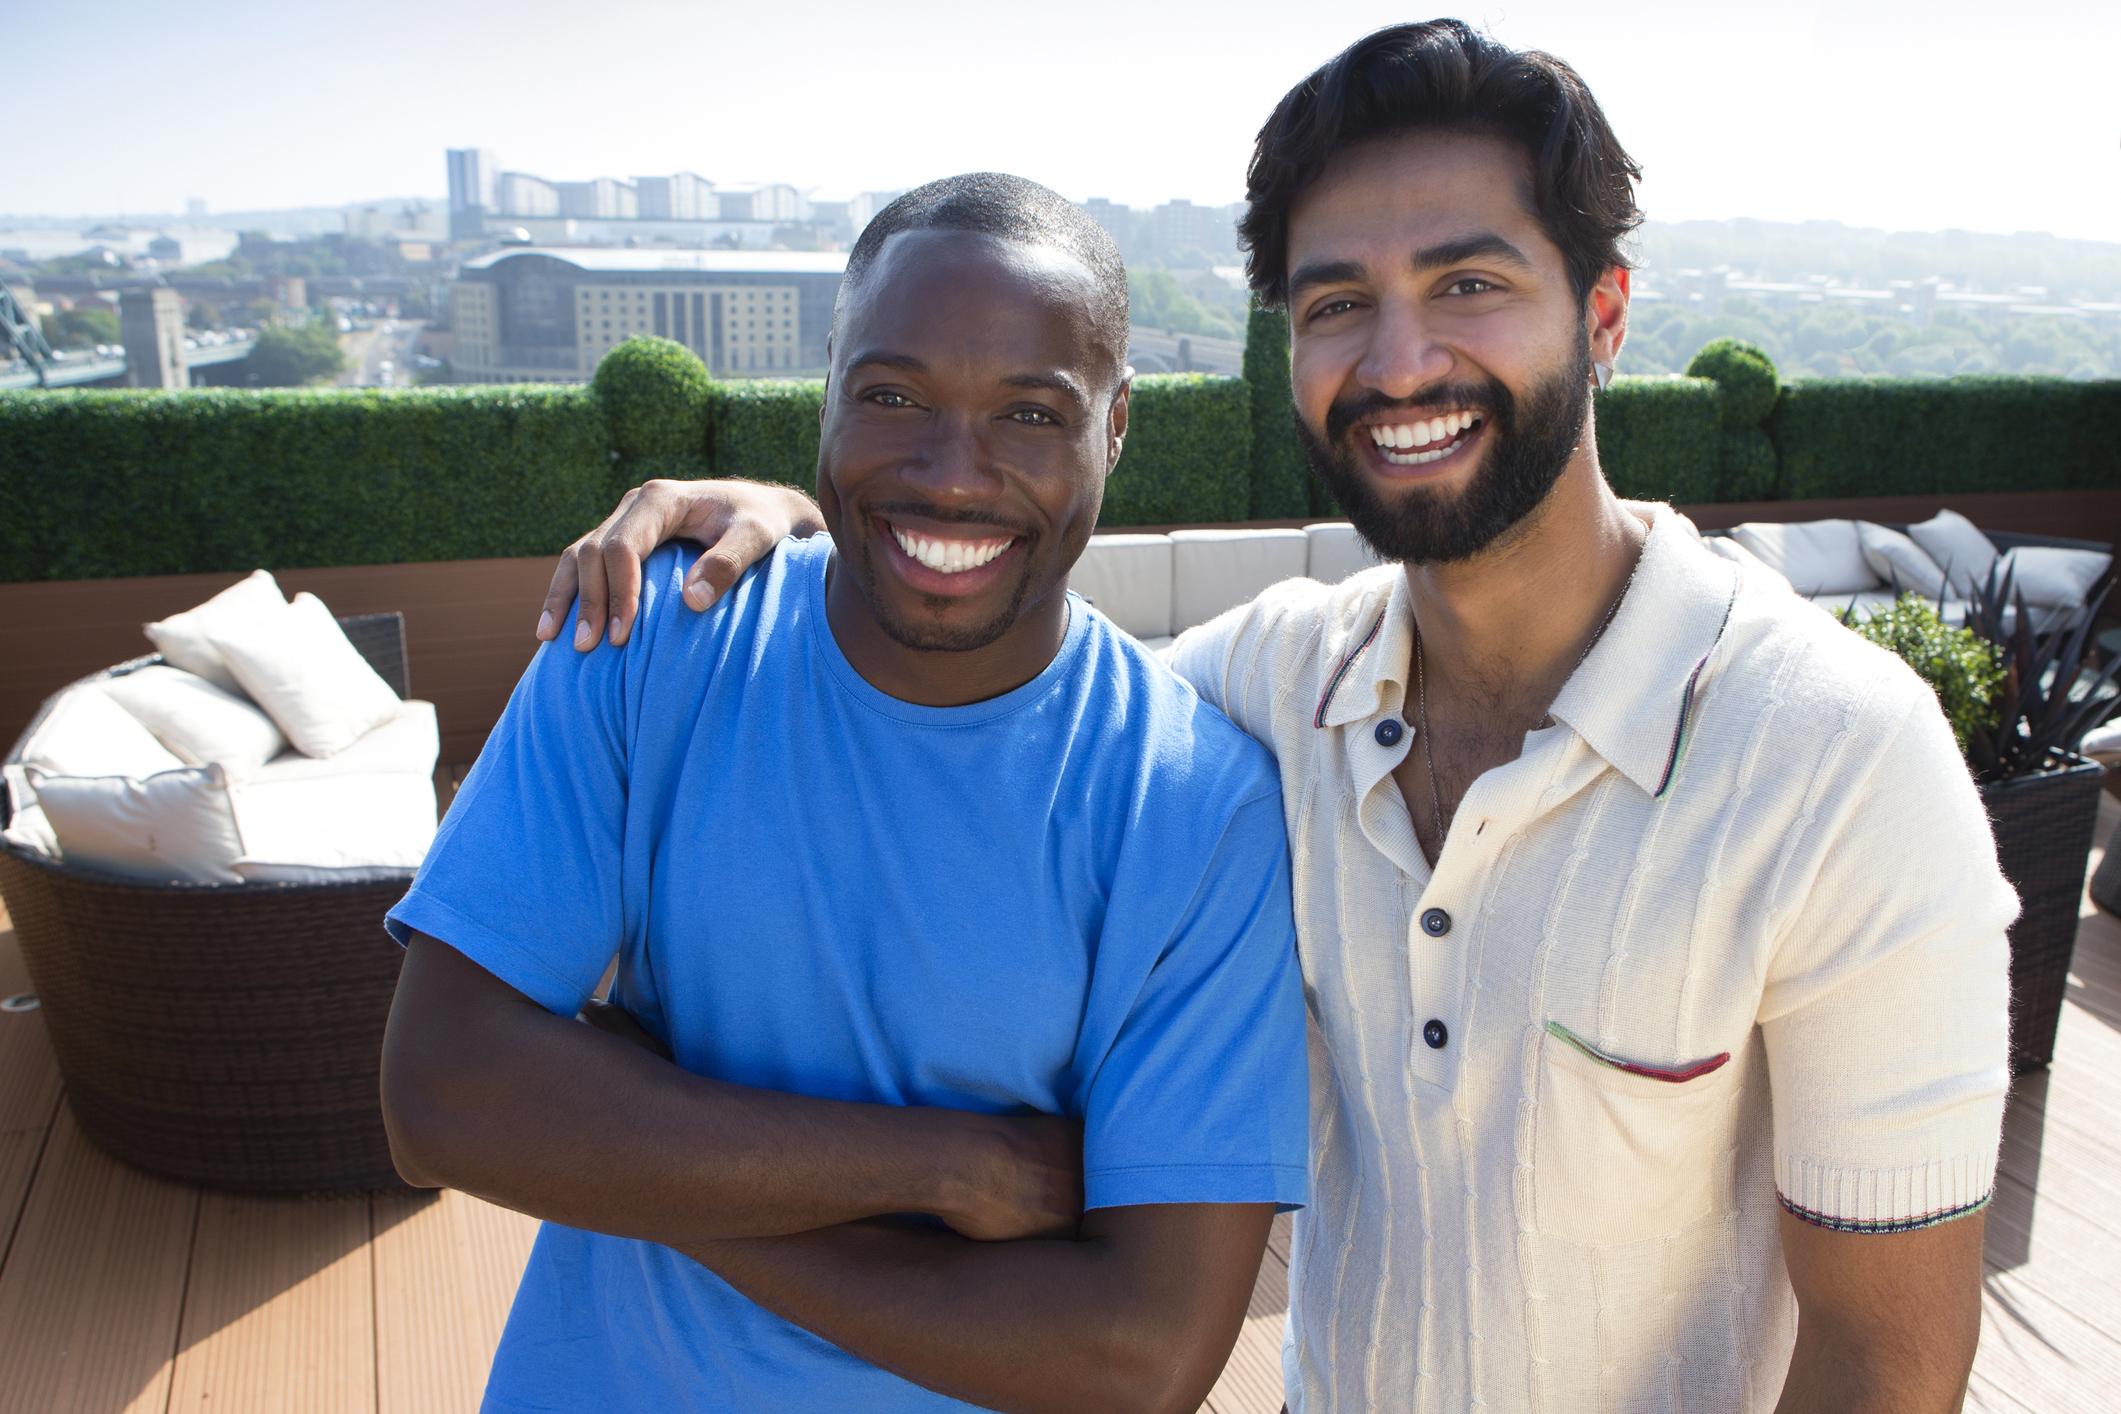 Reliant Recognizes National Men's Health Week